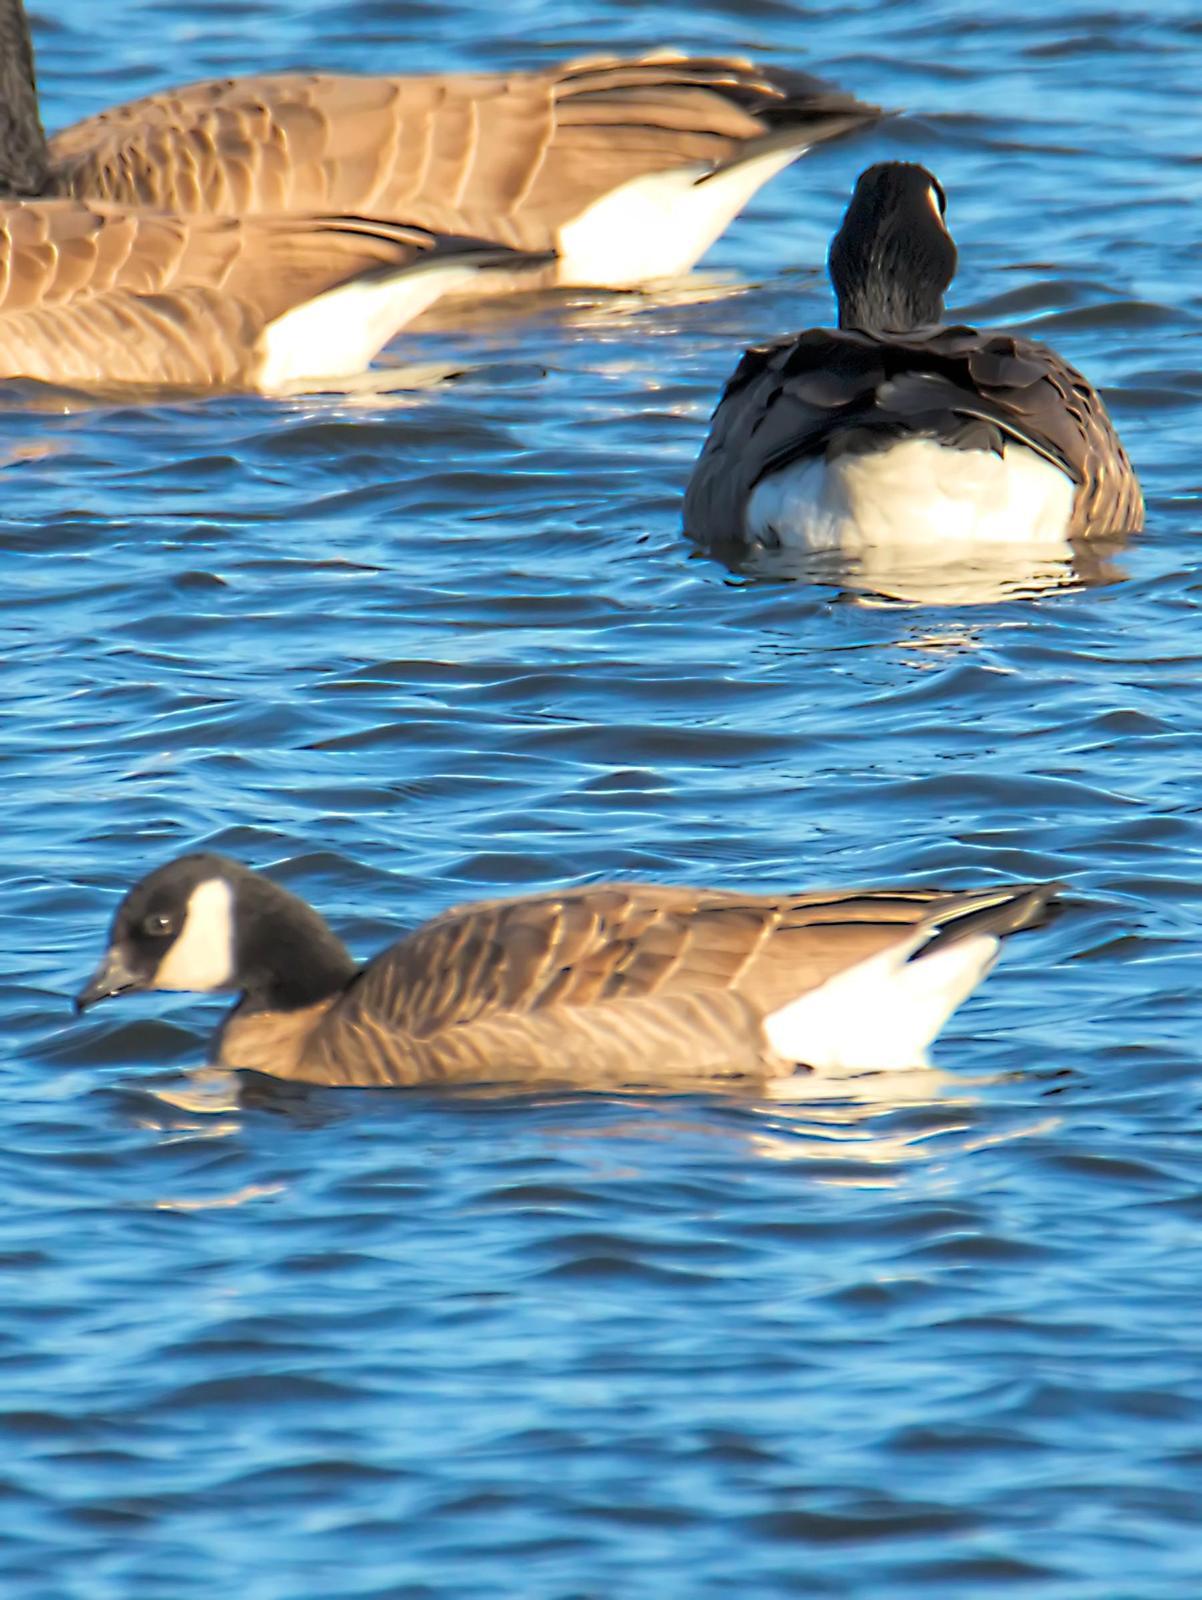 Cackling Goose Photo by Dan Tallman